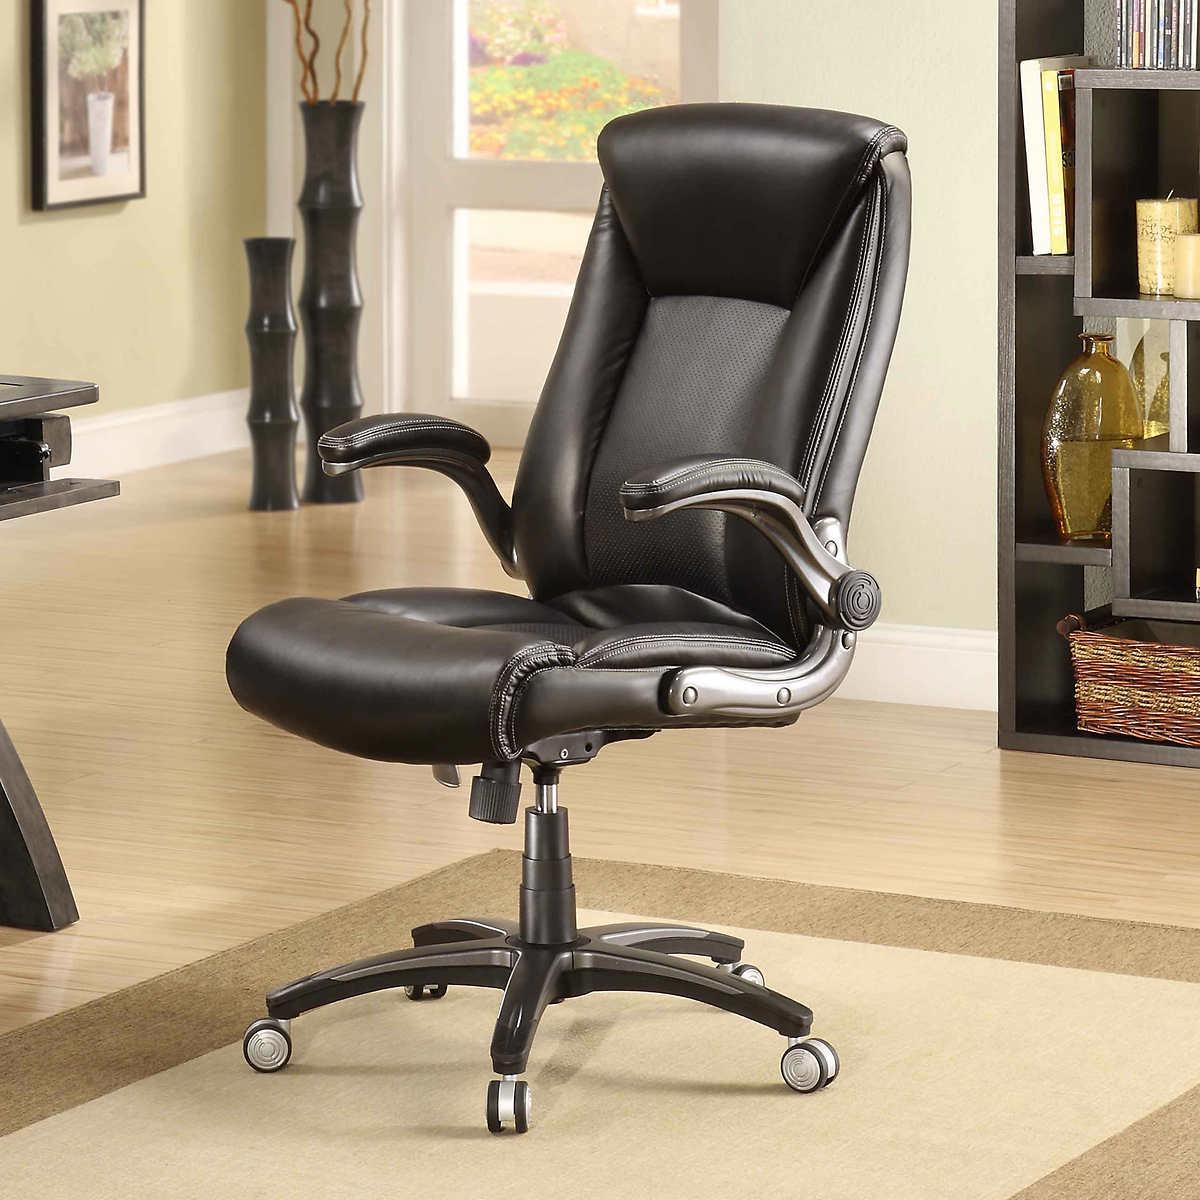 bayside furnishings office furniture | costco